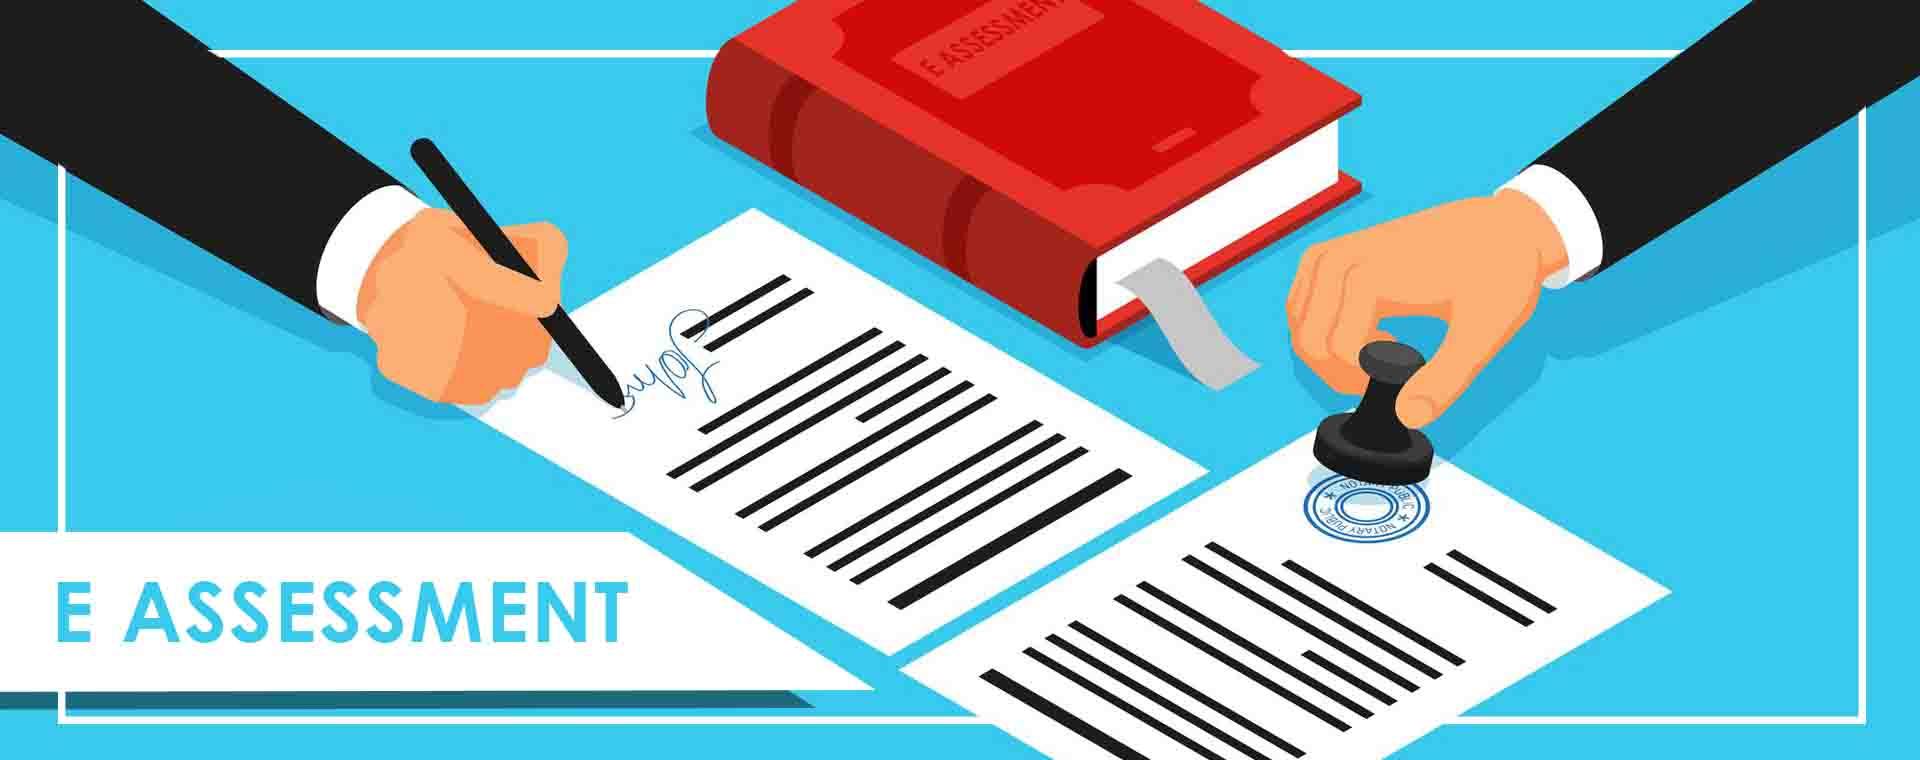 e-assessment service provider